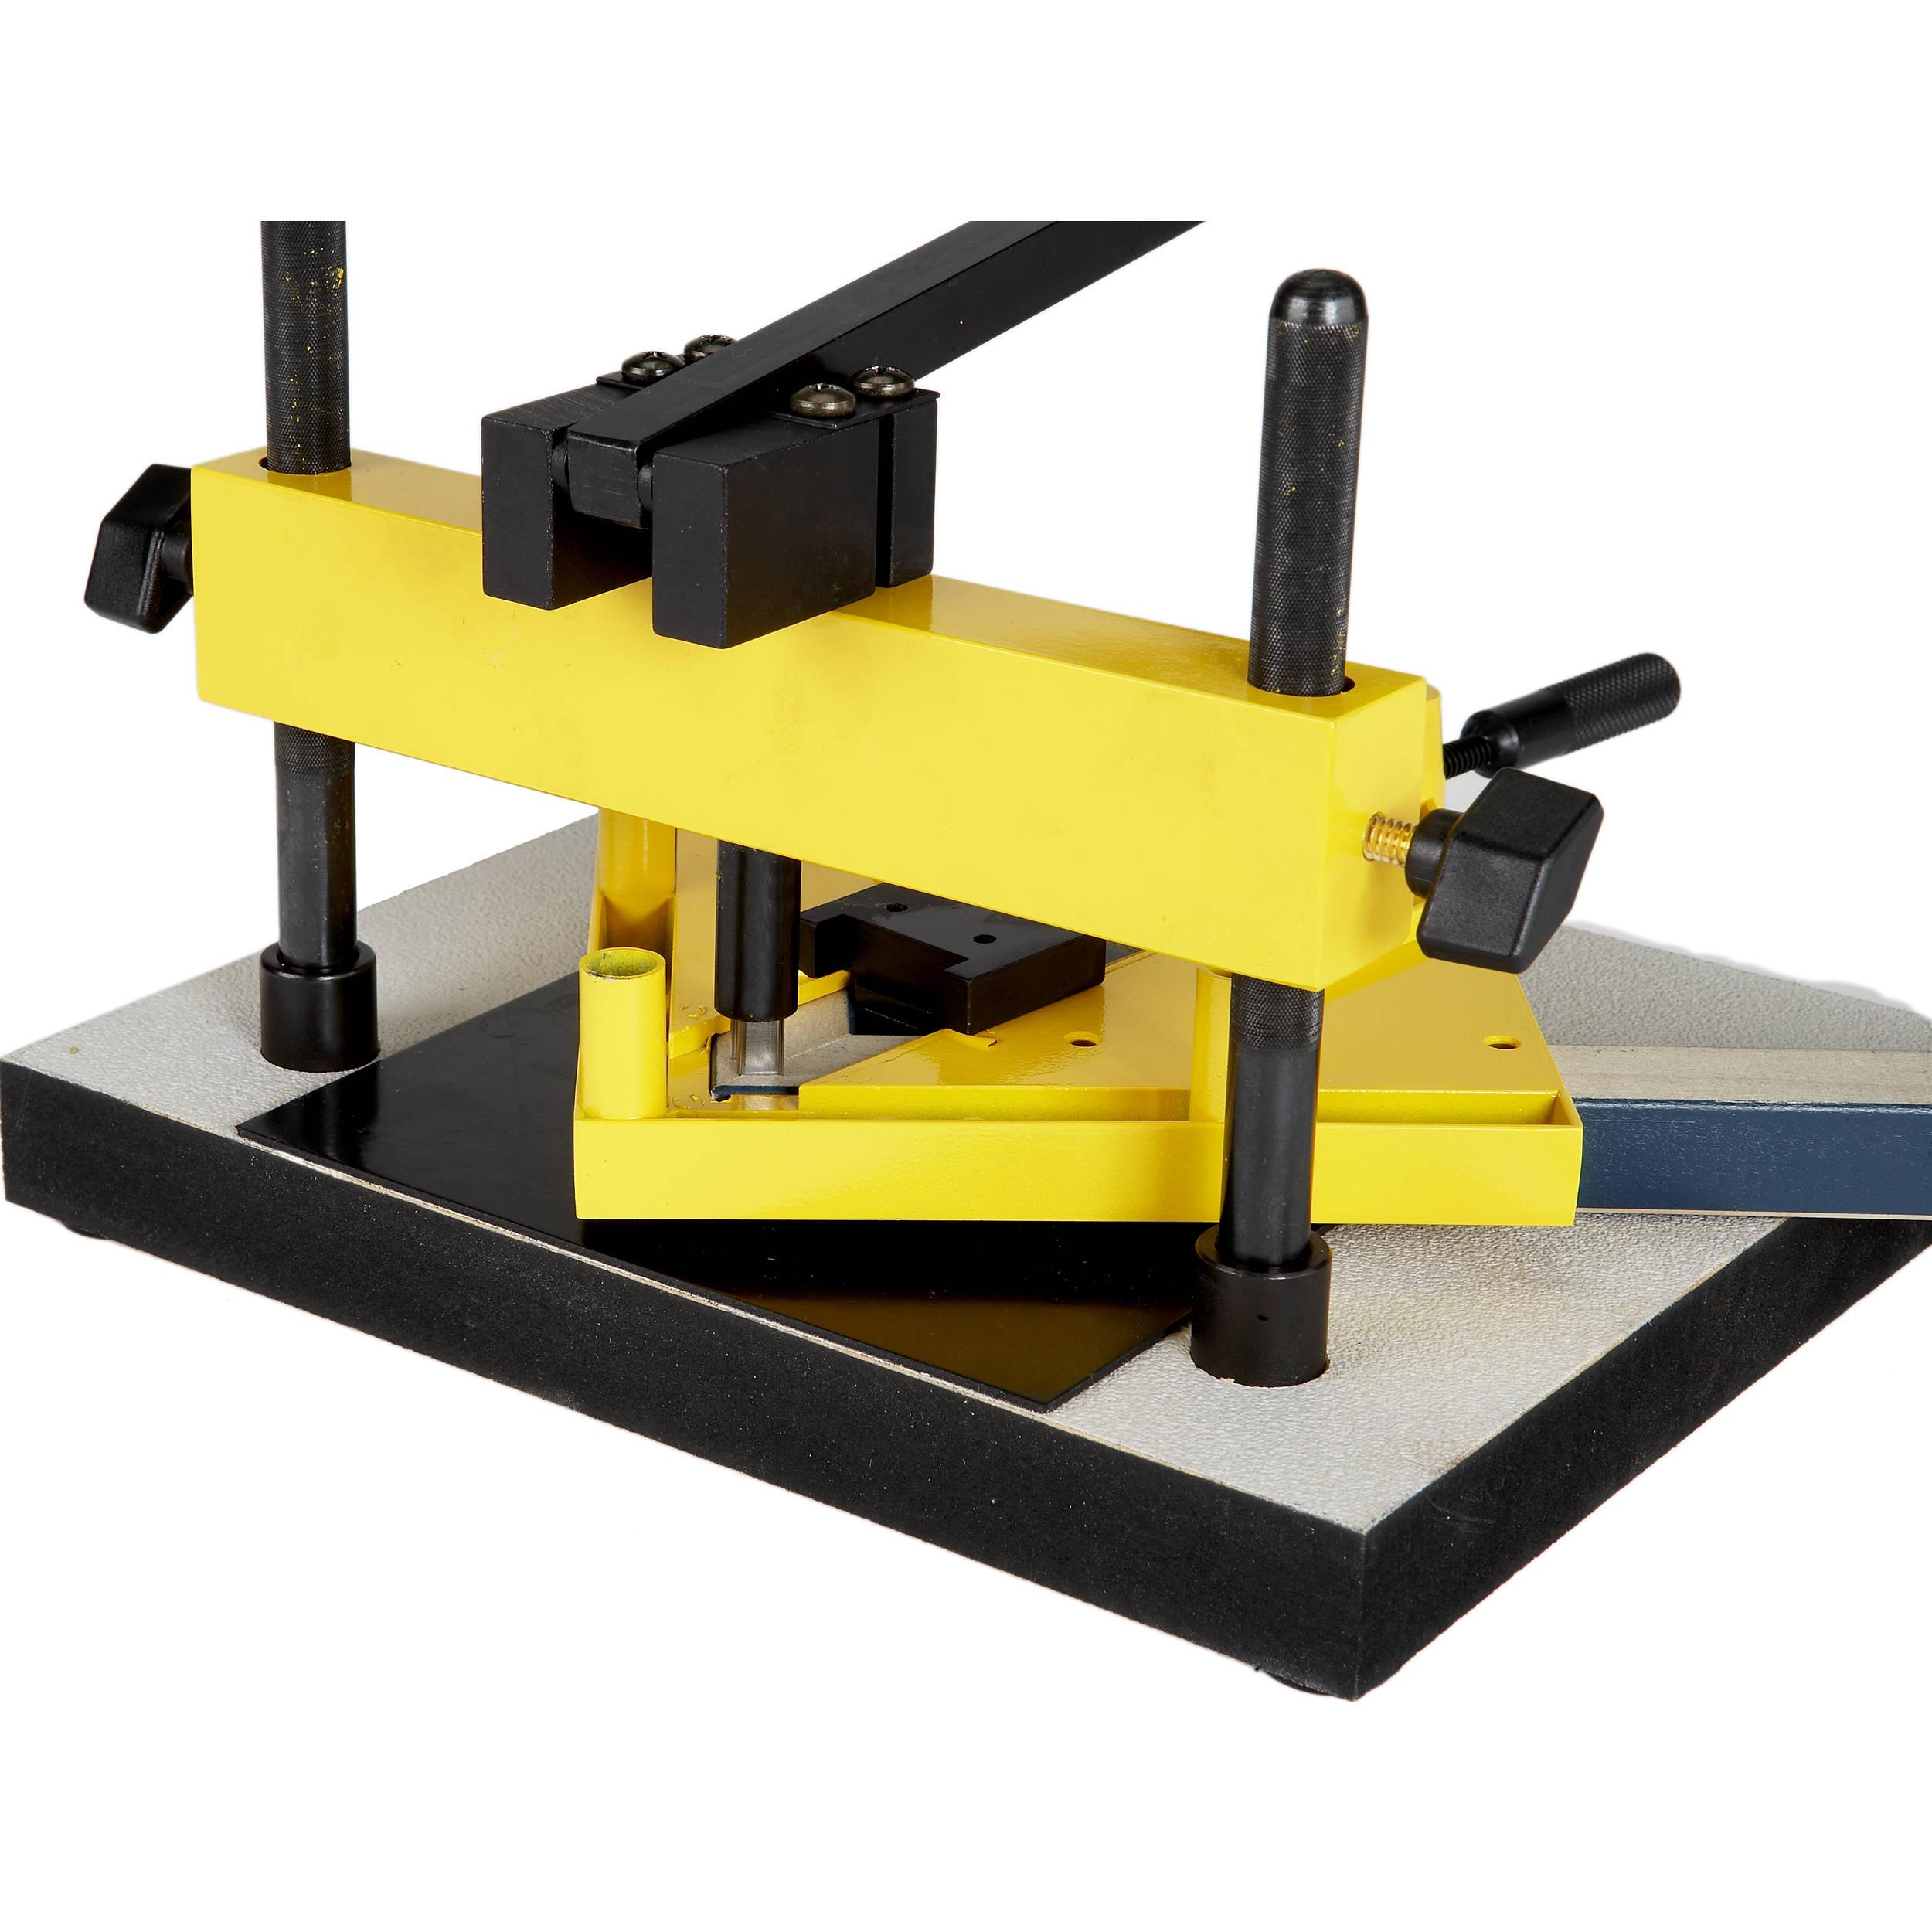 Logan Graphics F300-1 Studio Wood Frame Joiner Tool F300-1 B&H